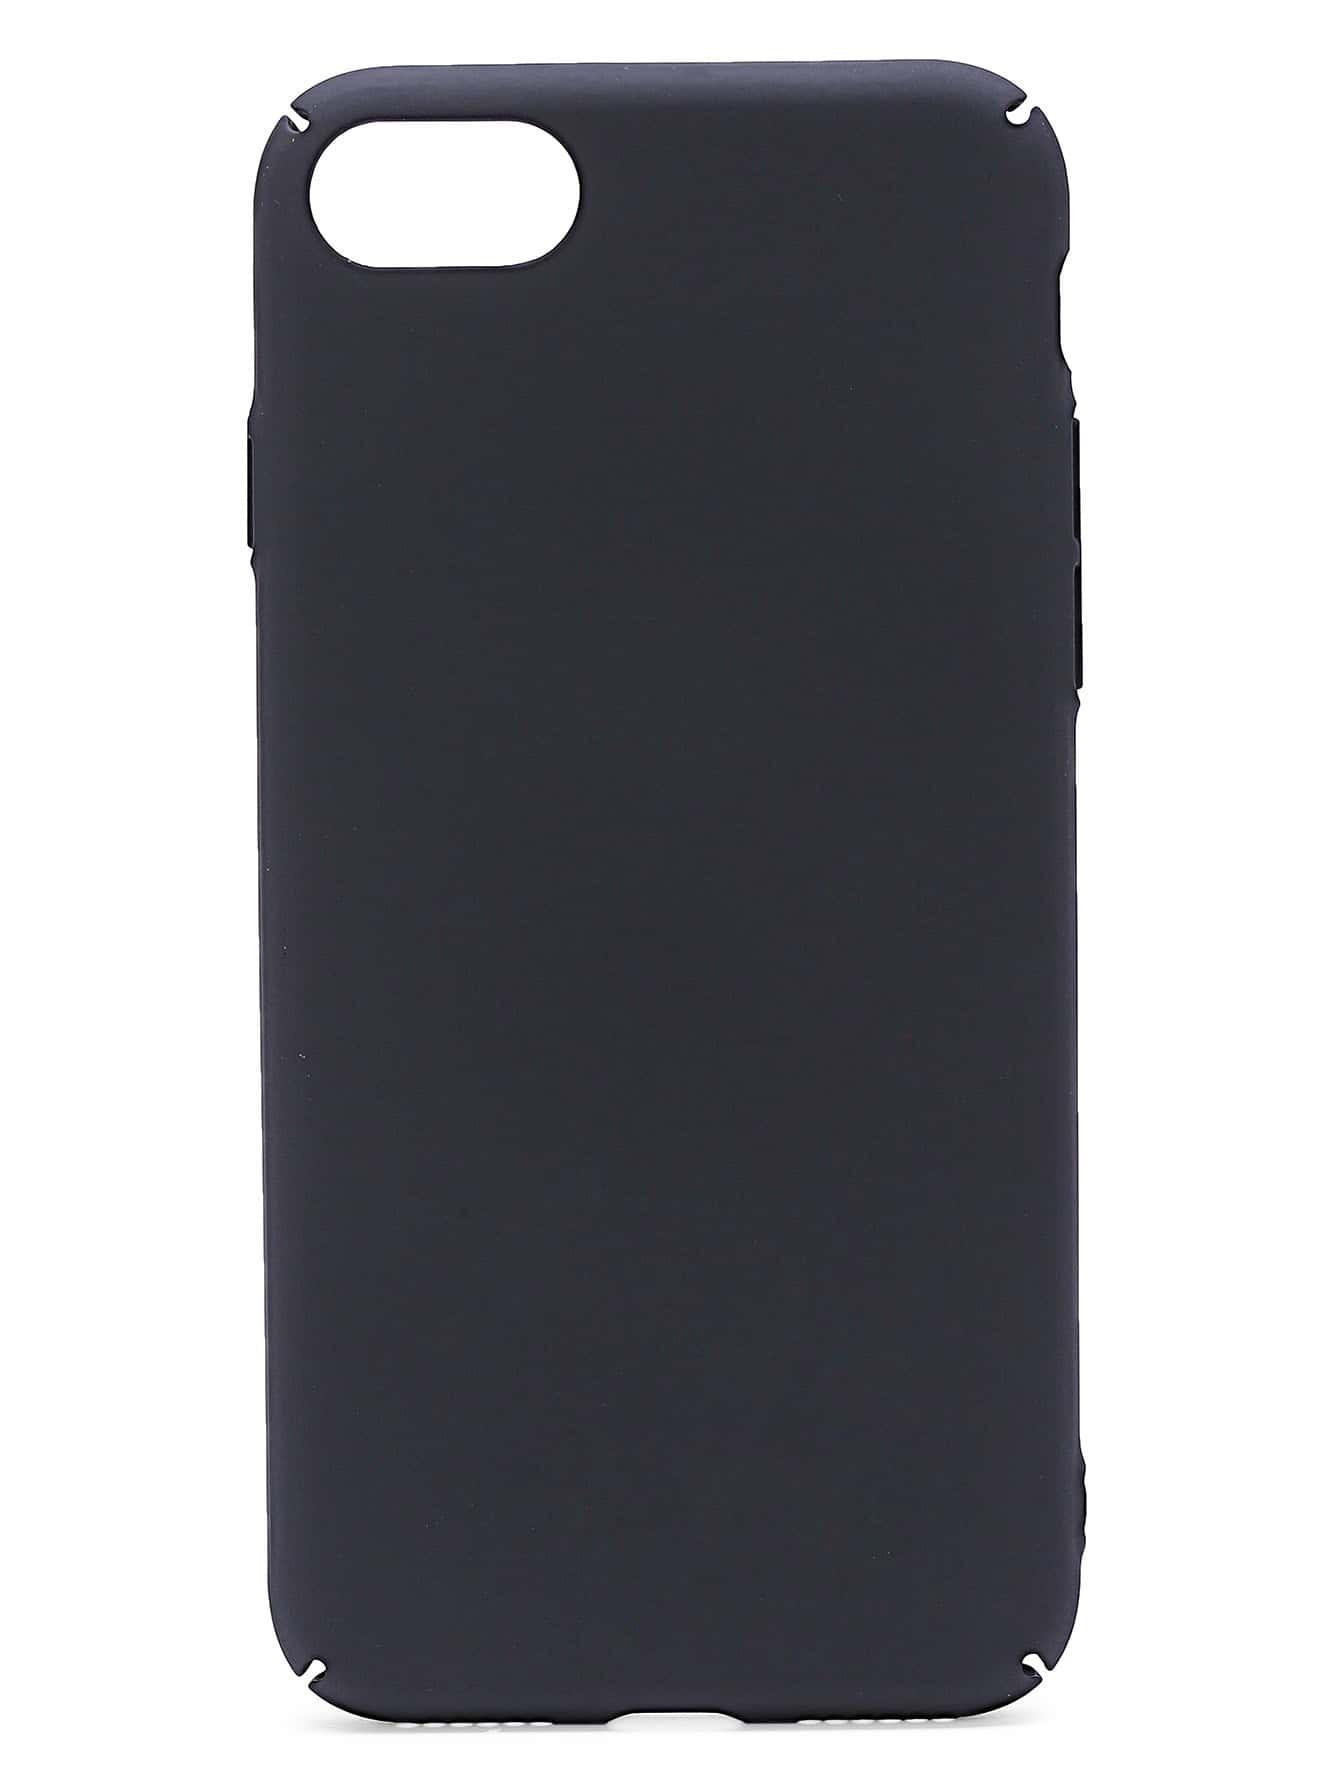 Plain Iphone S Cases